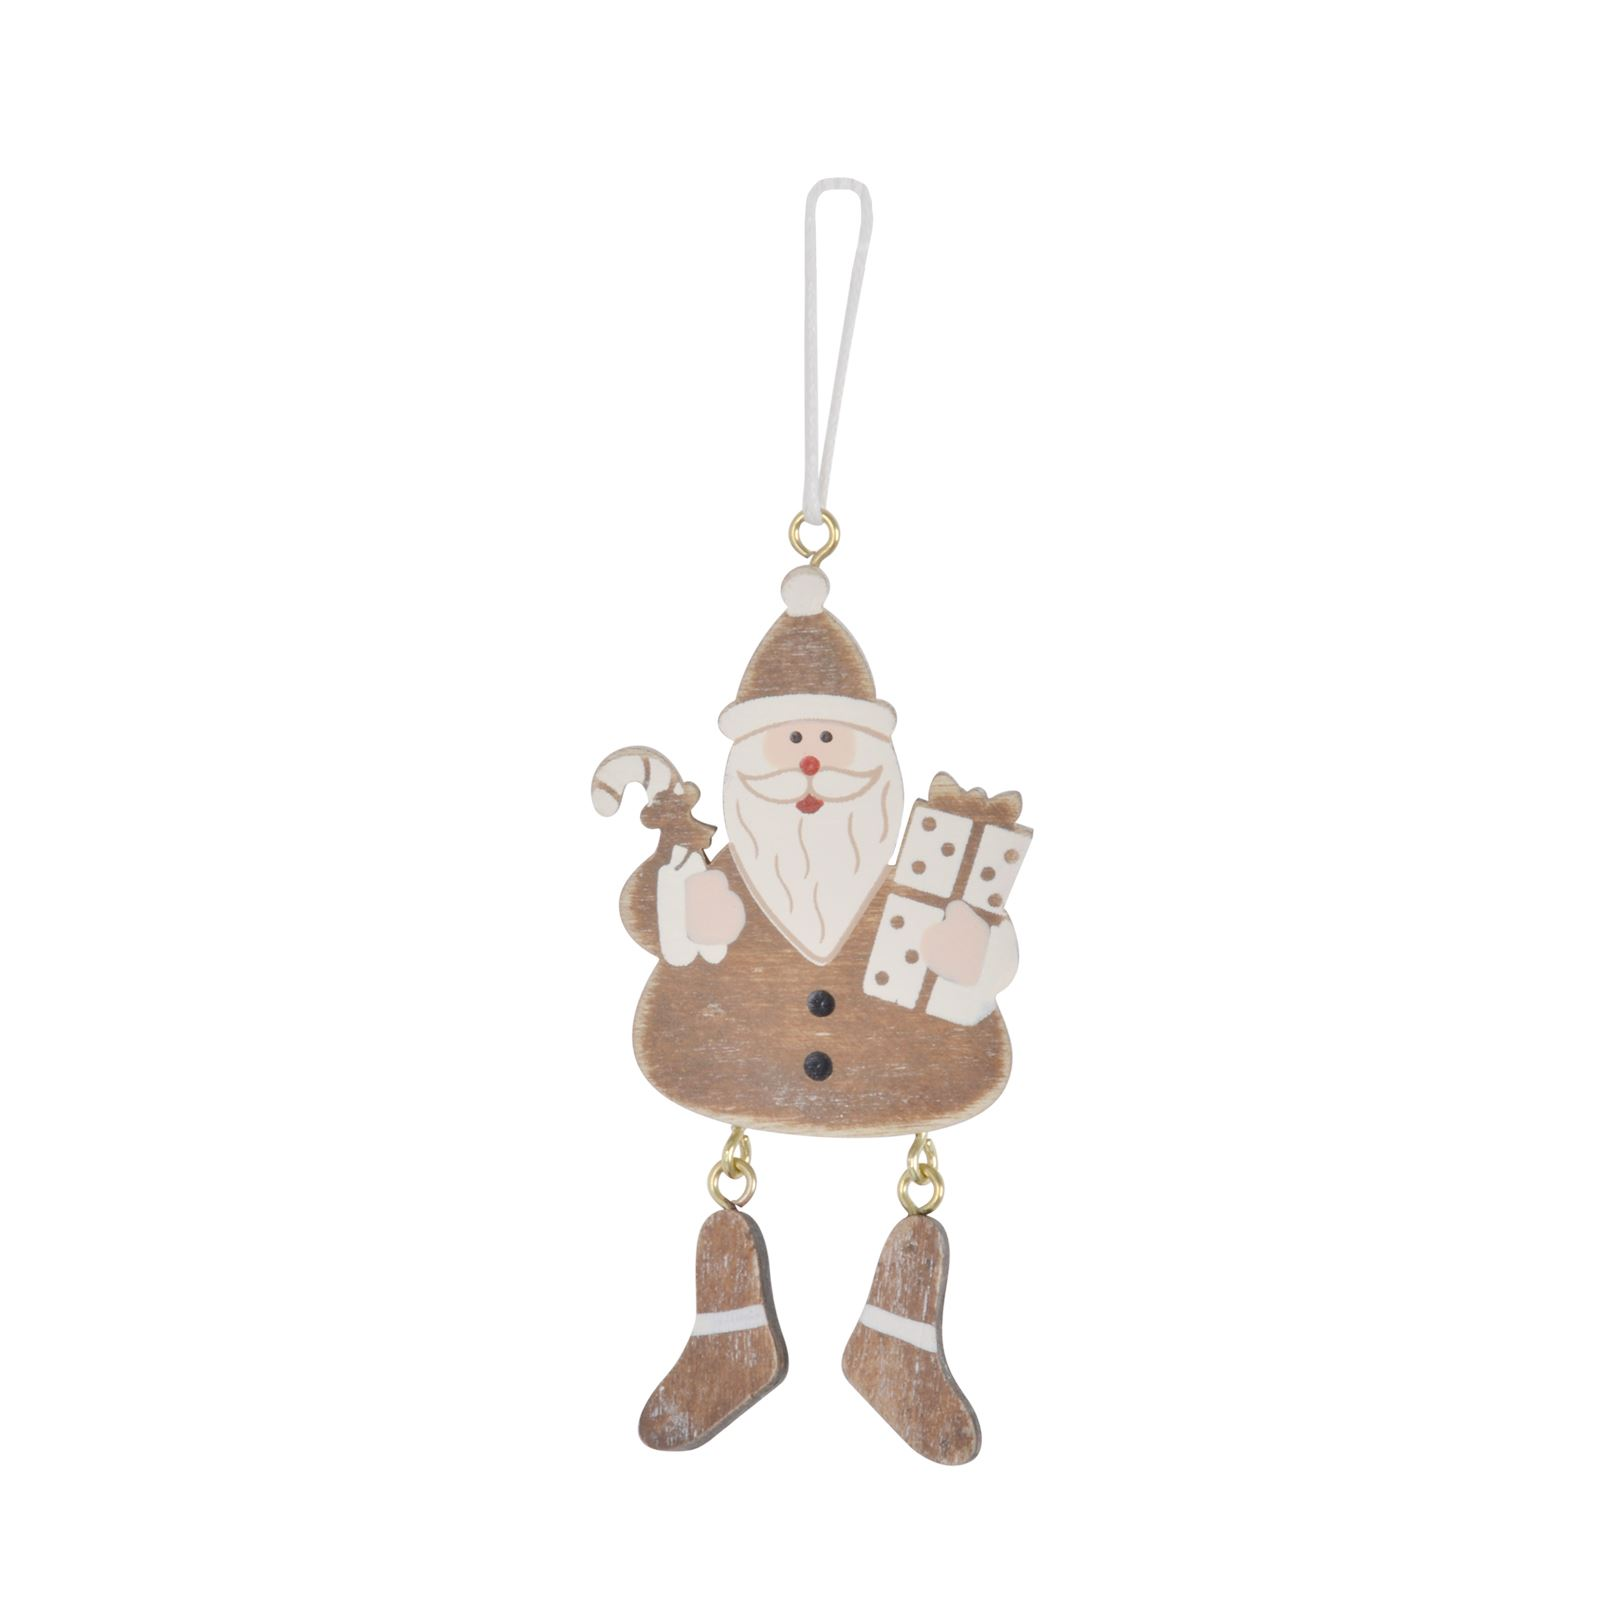 Christmas Tree Decorations Pack Novelty Hanging Ornaments Xmas ...